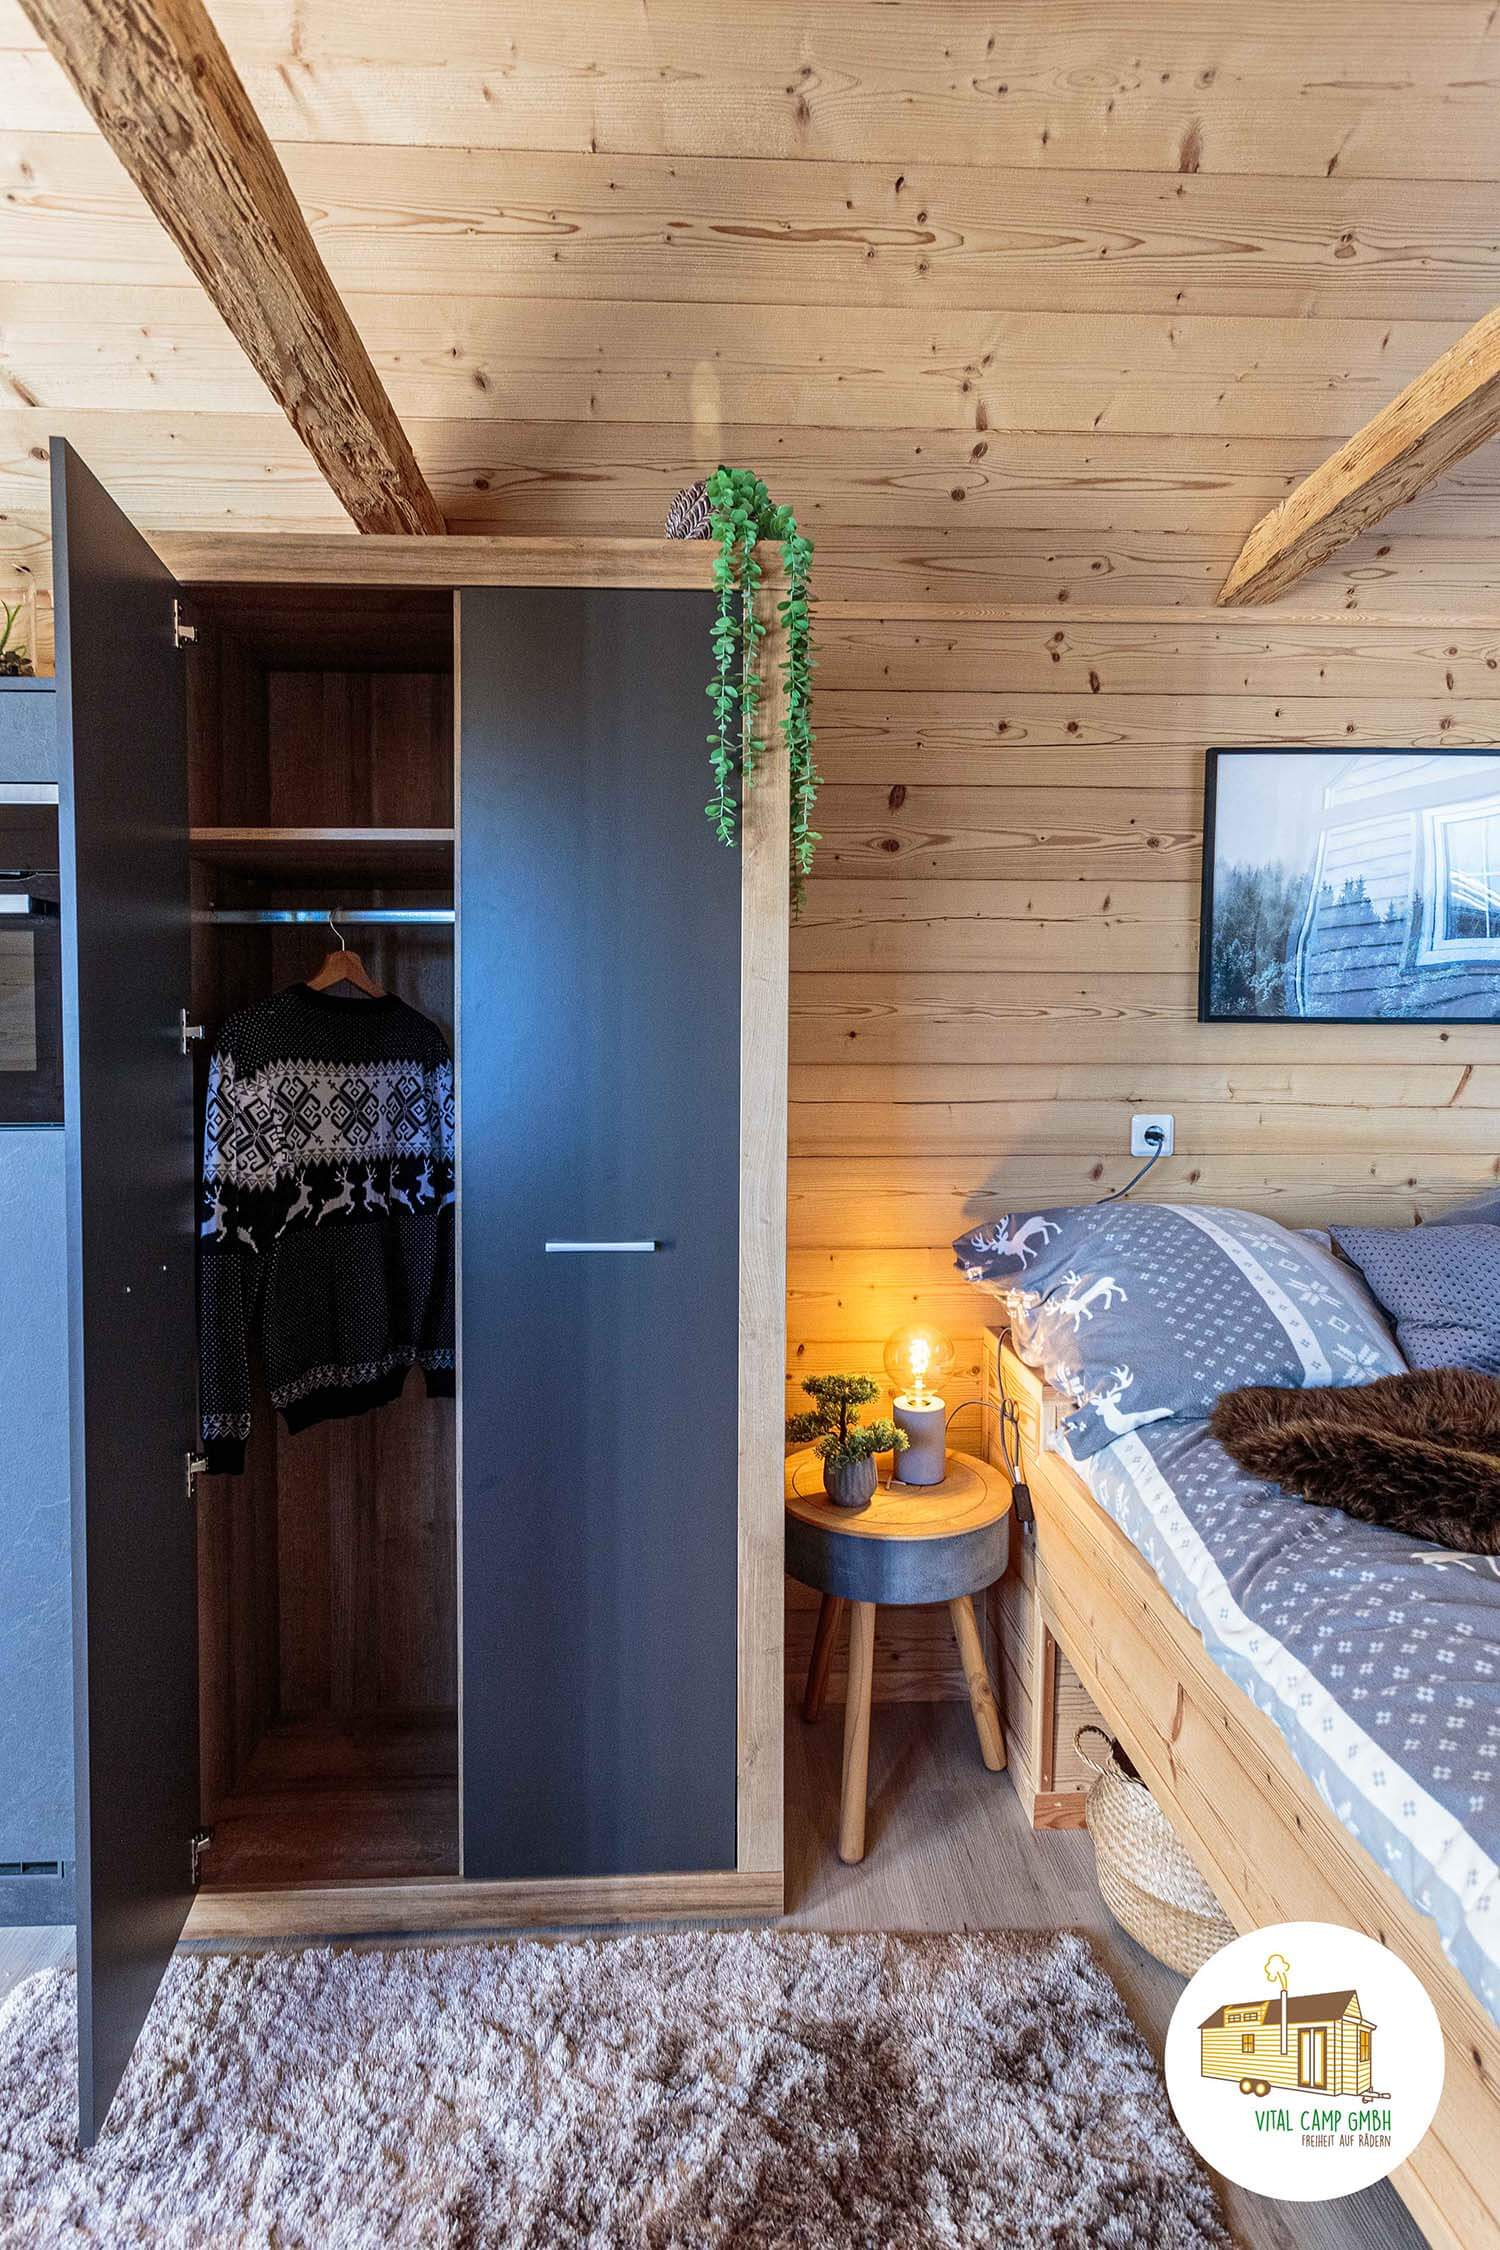 mobiles-chalet-finnland-vital-camp-gmbh-21